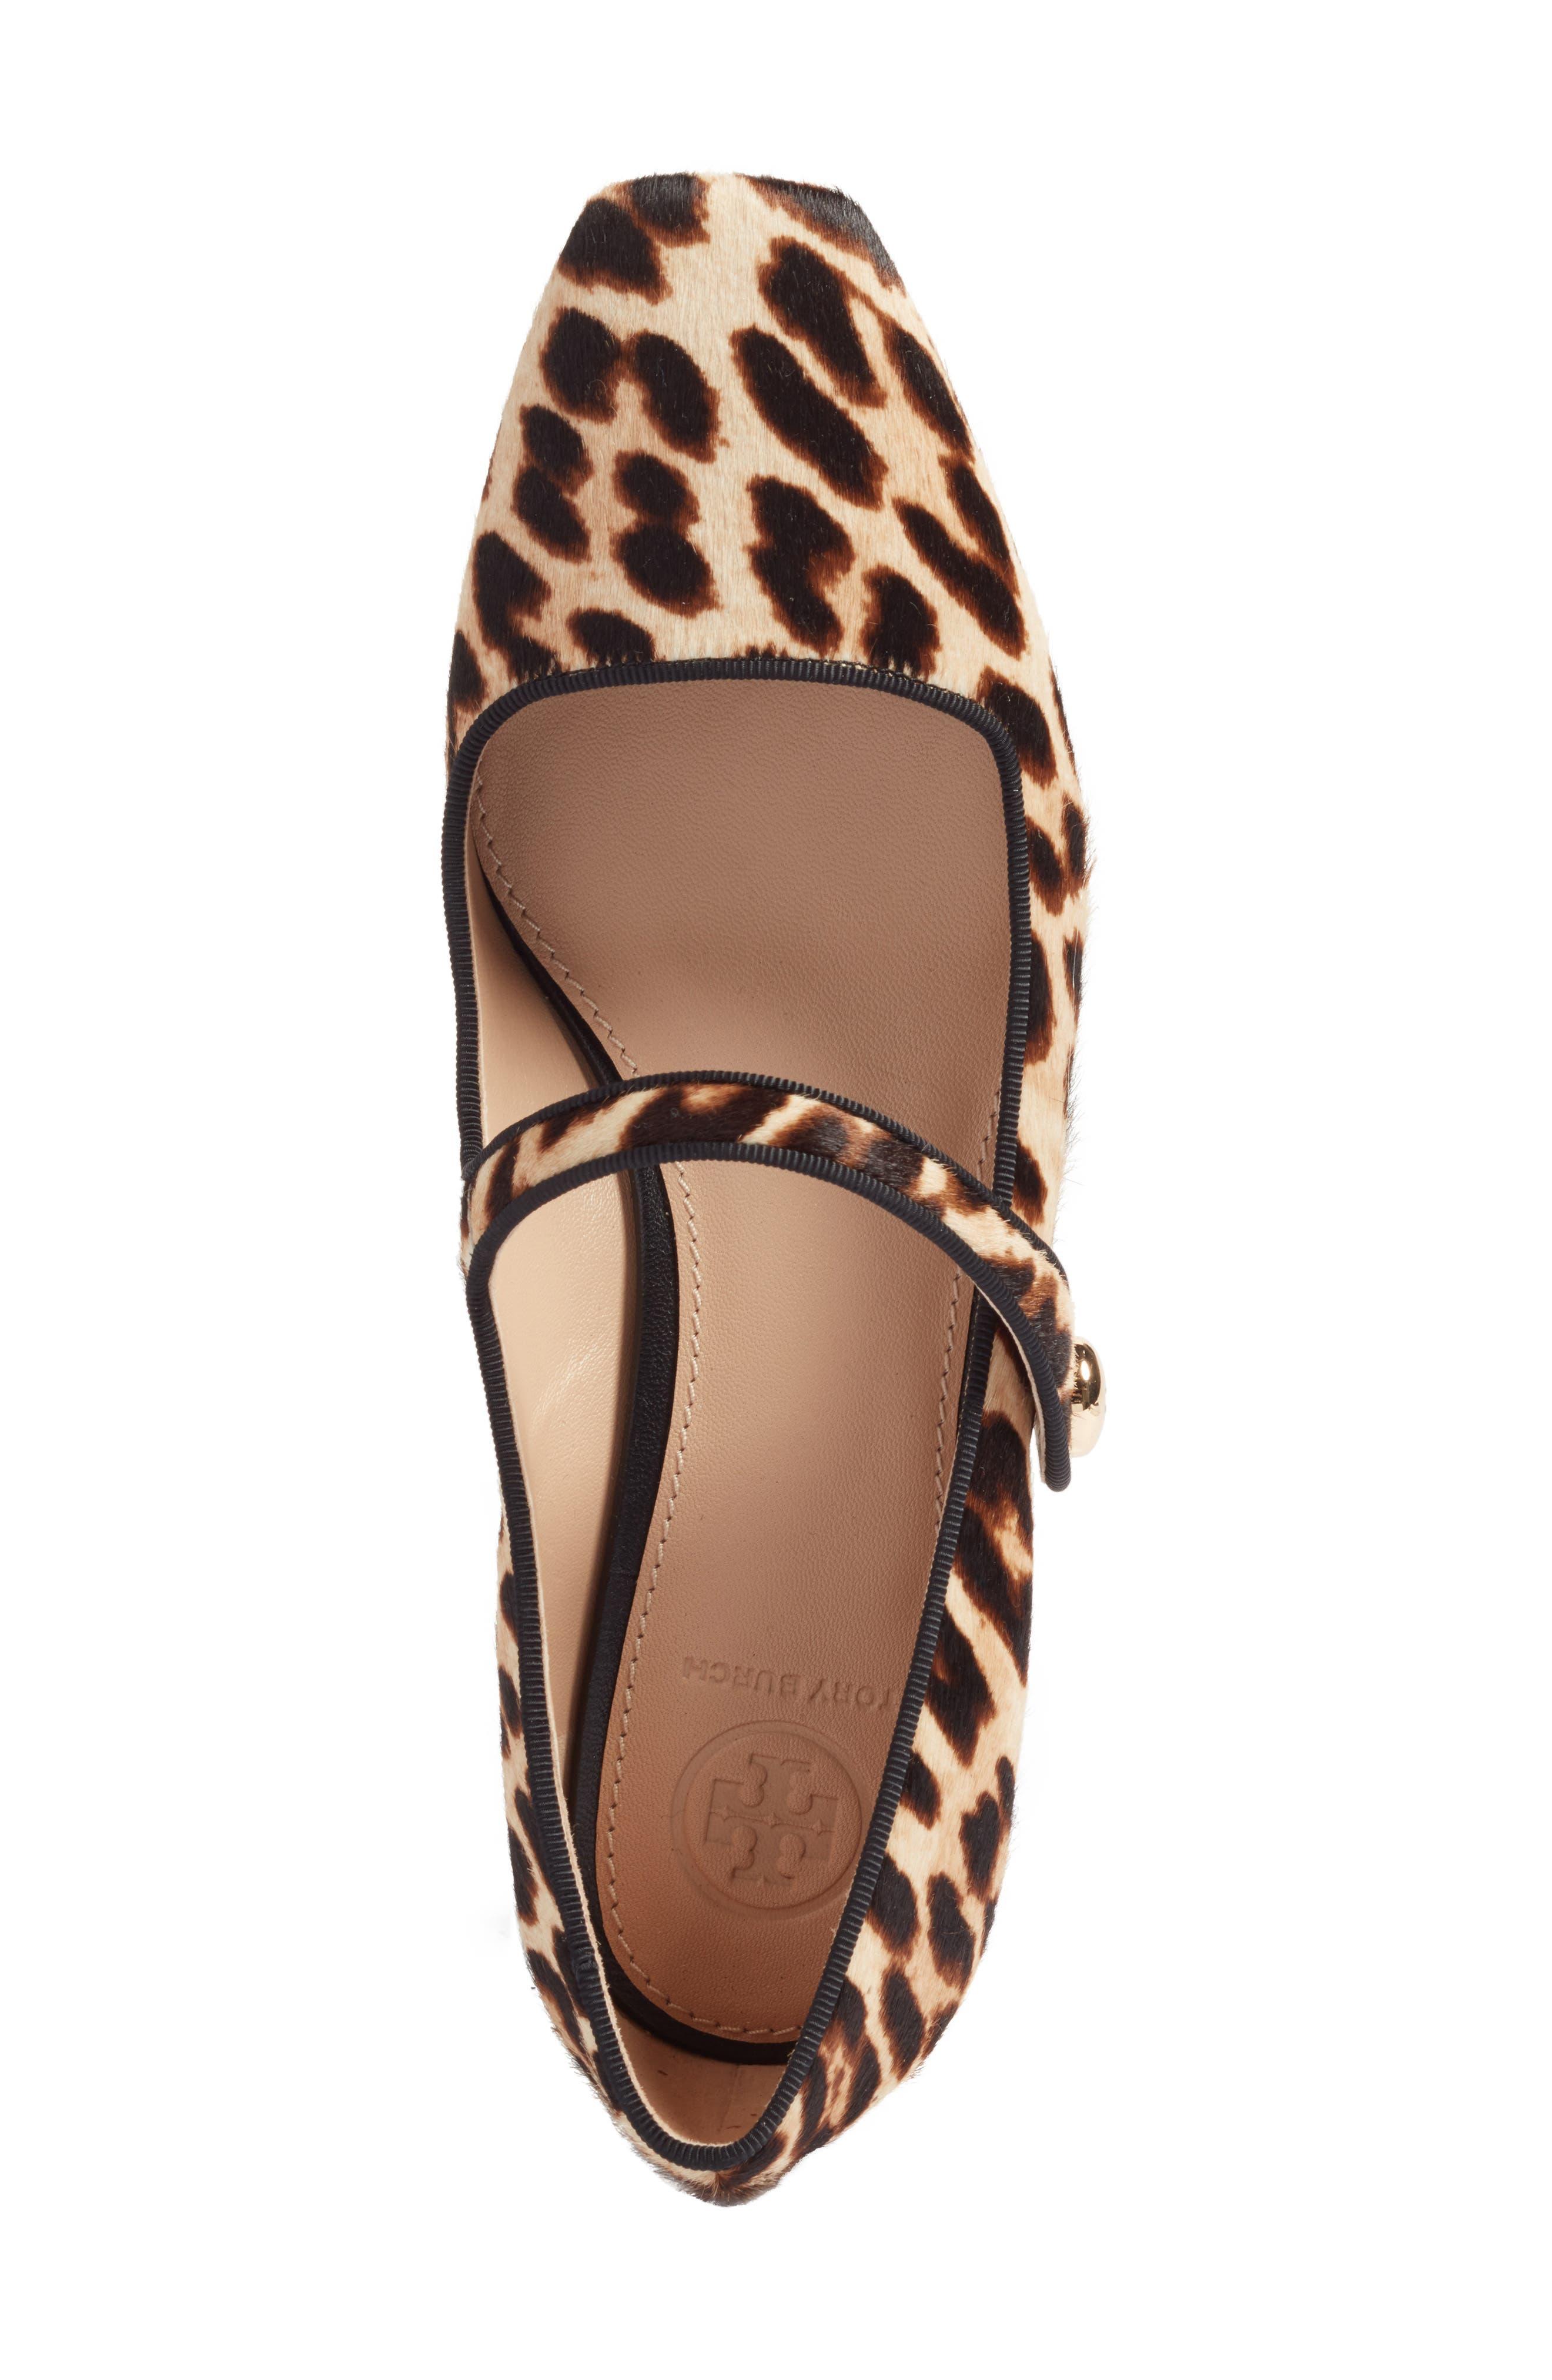 Marisa Genuine Calf Hair Mary Jane Pump,                             Alternate thumbnail 4, color,                             Natural Leopard/ Black